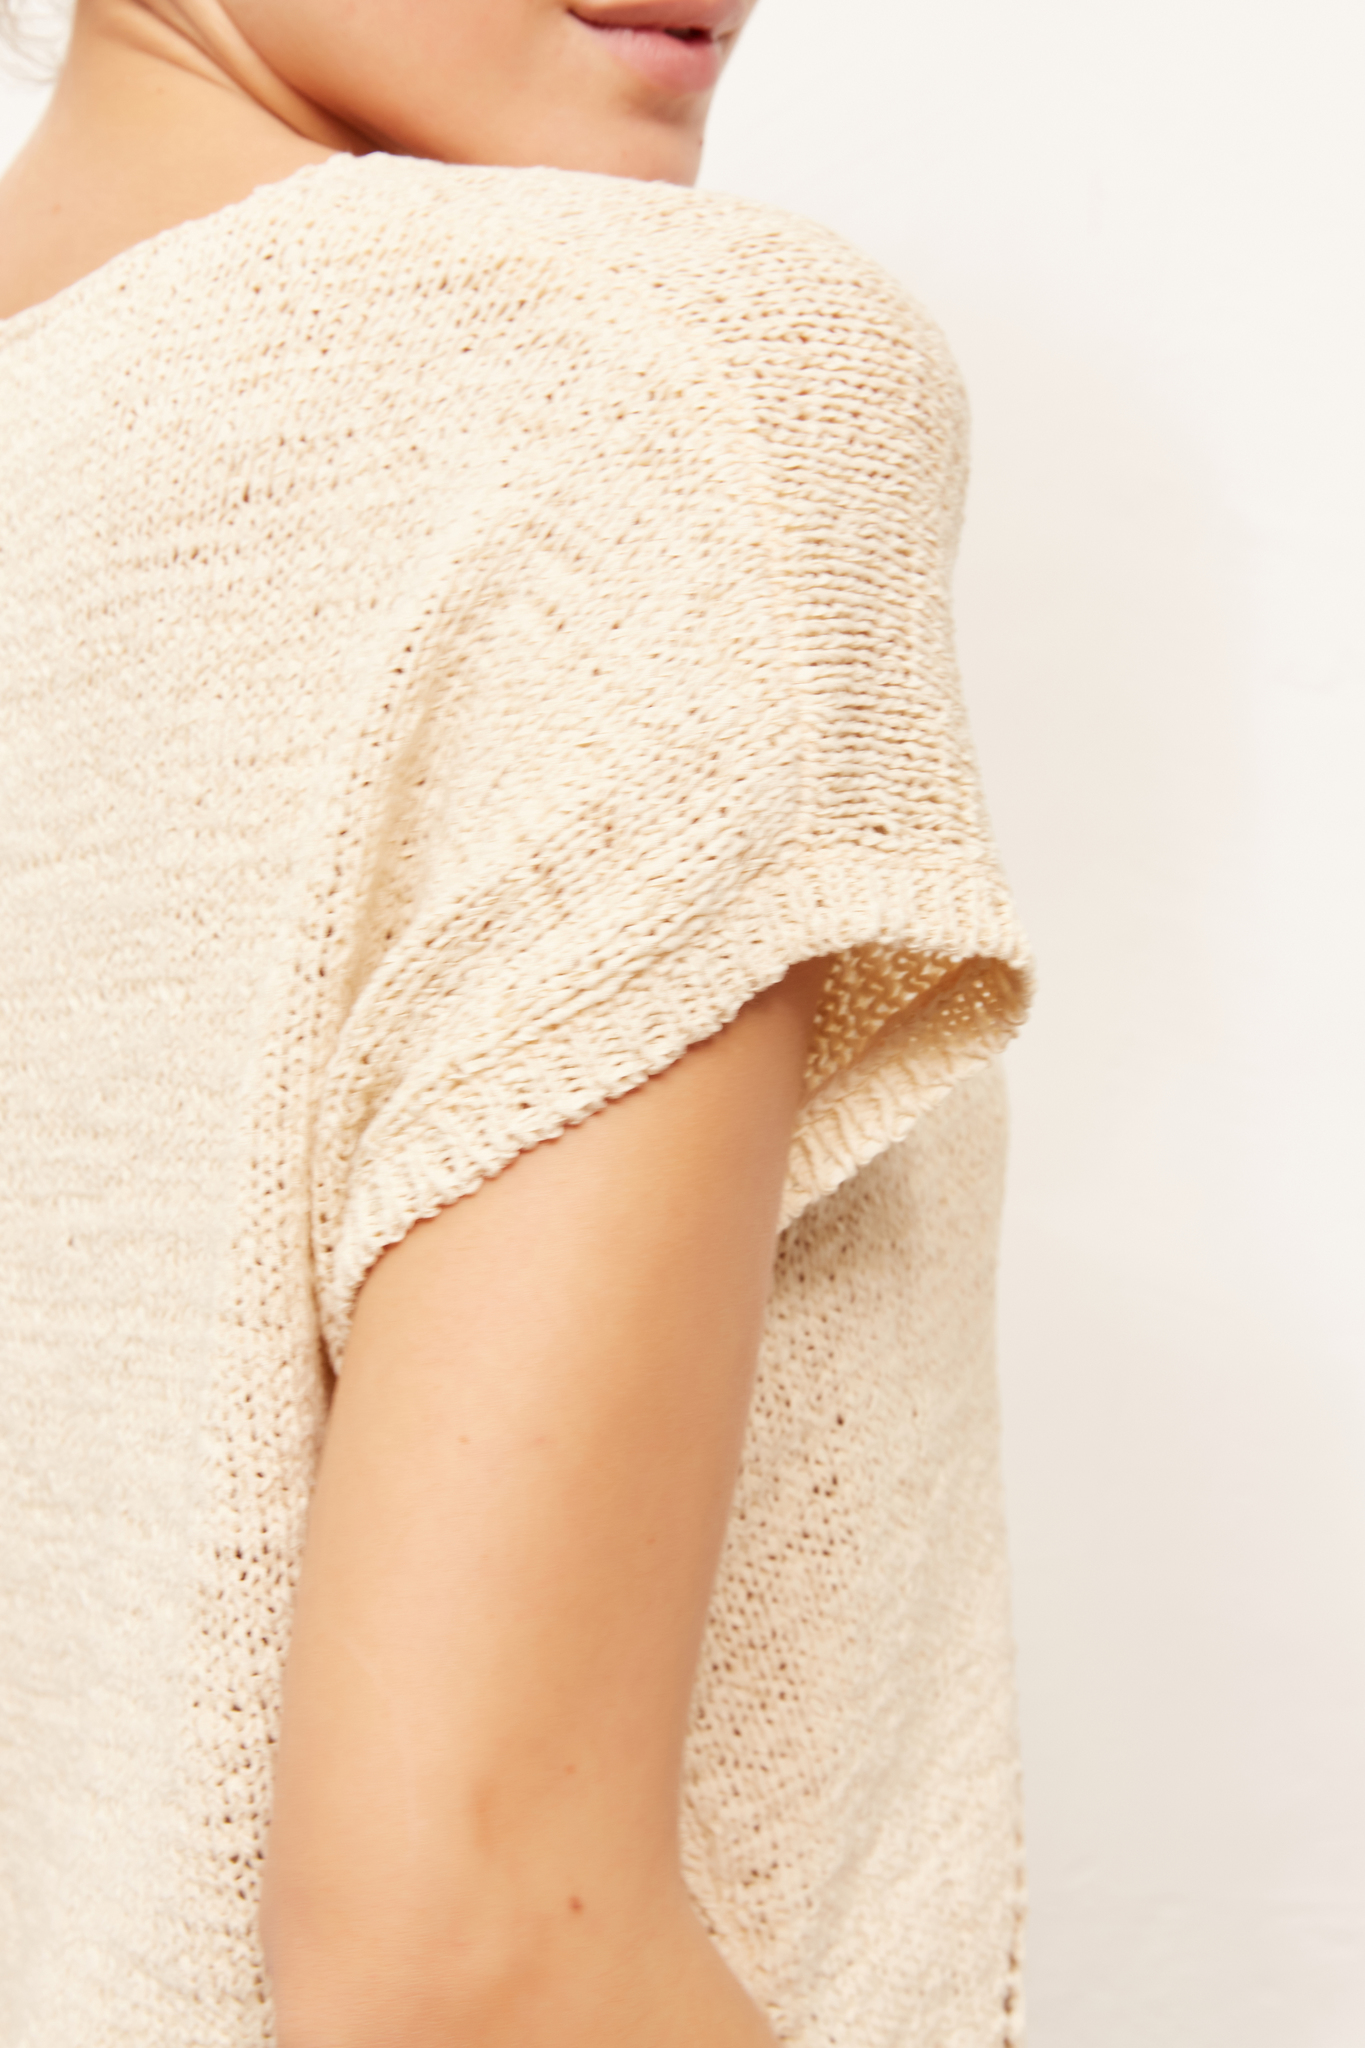 ELISE - Пуловер с узором в стиле макраме с короткими рукавами